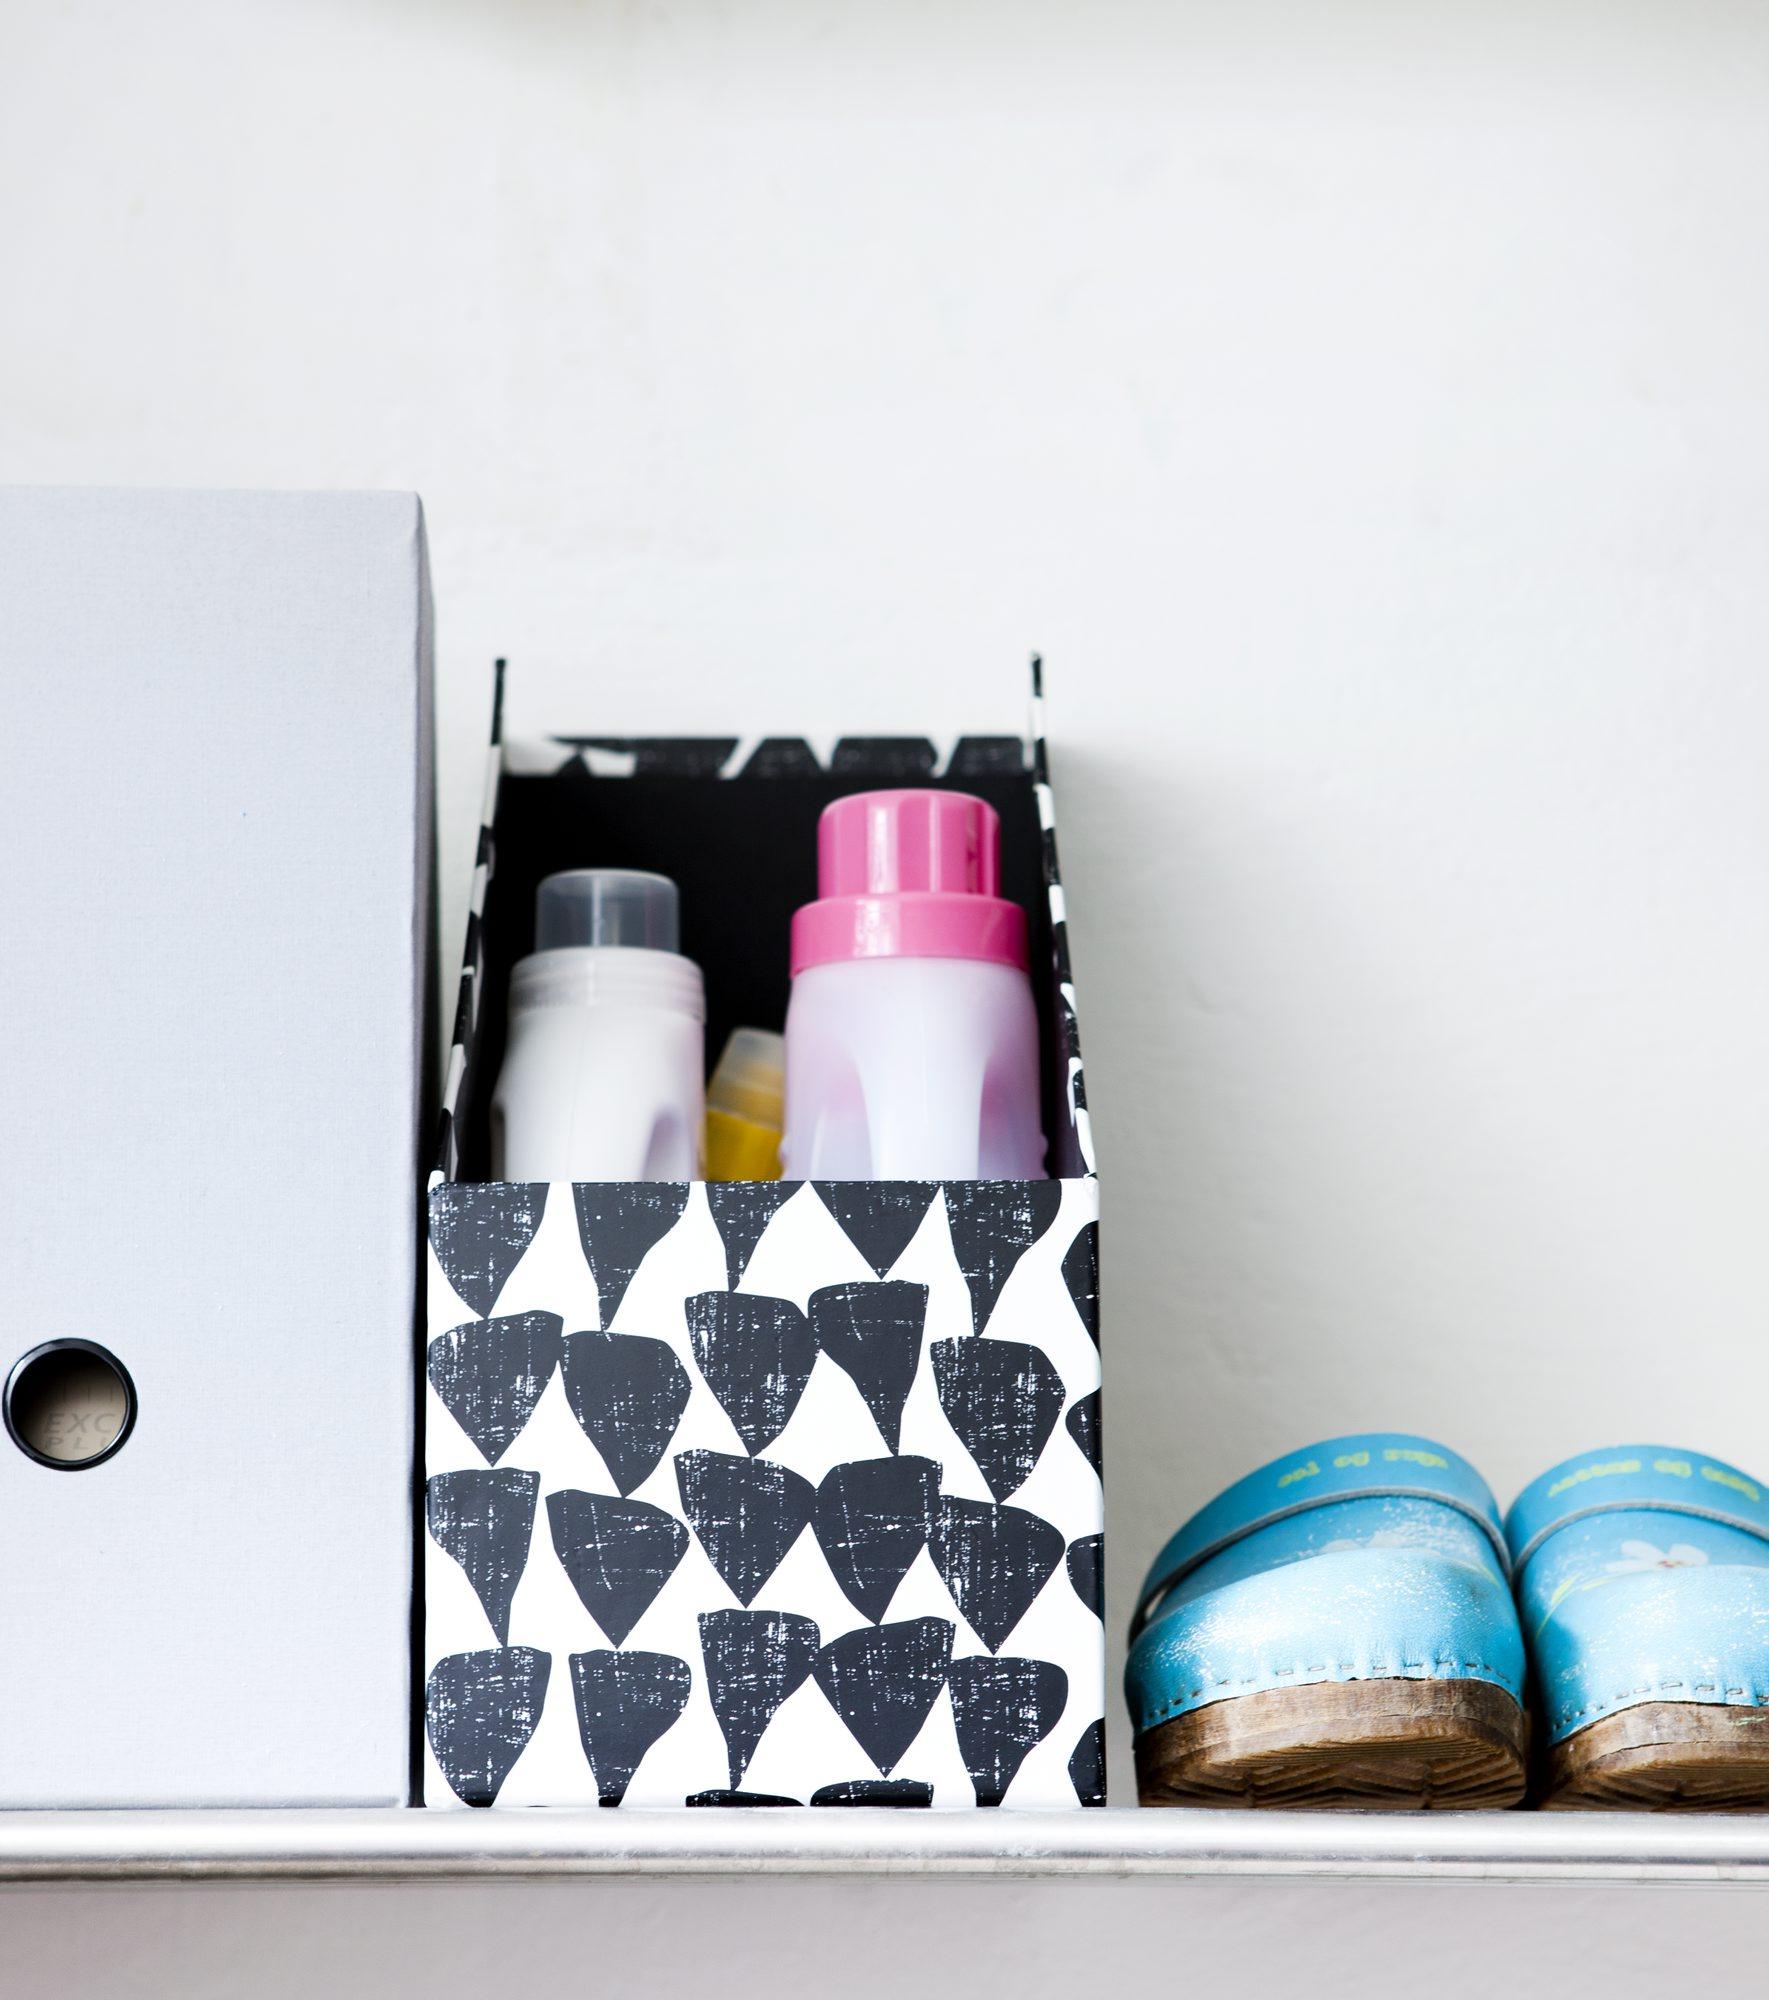 Smart oppbevaring på vaskerommet